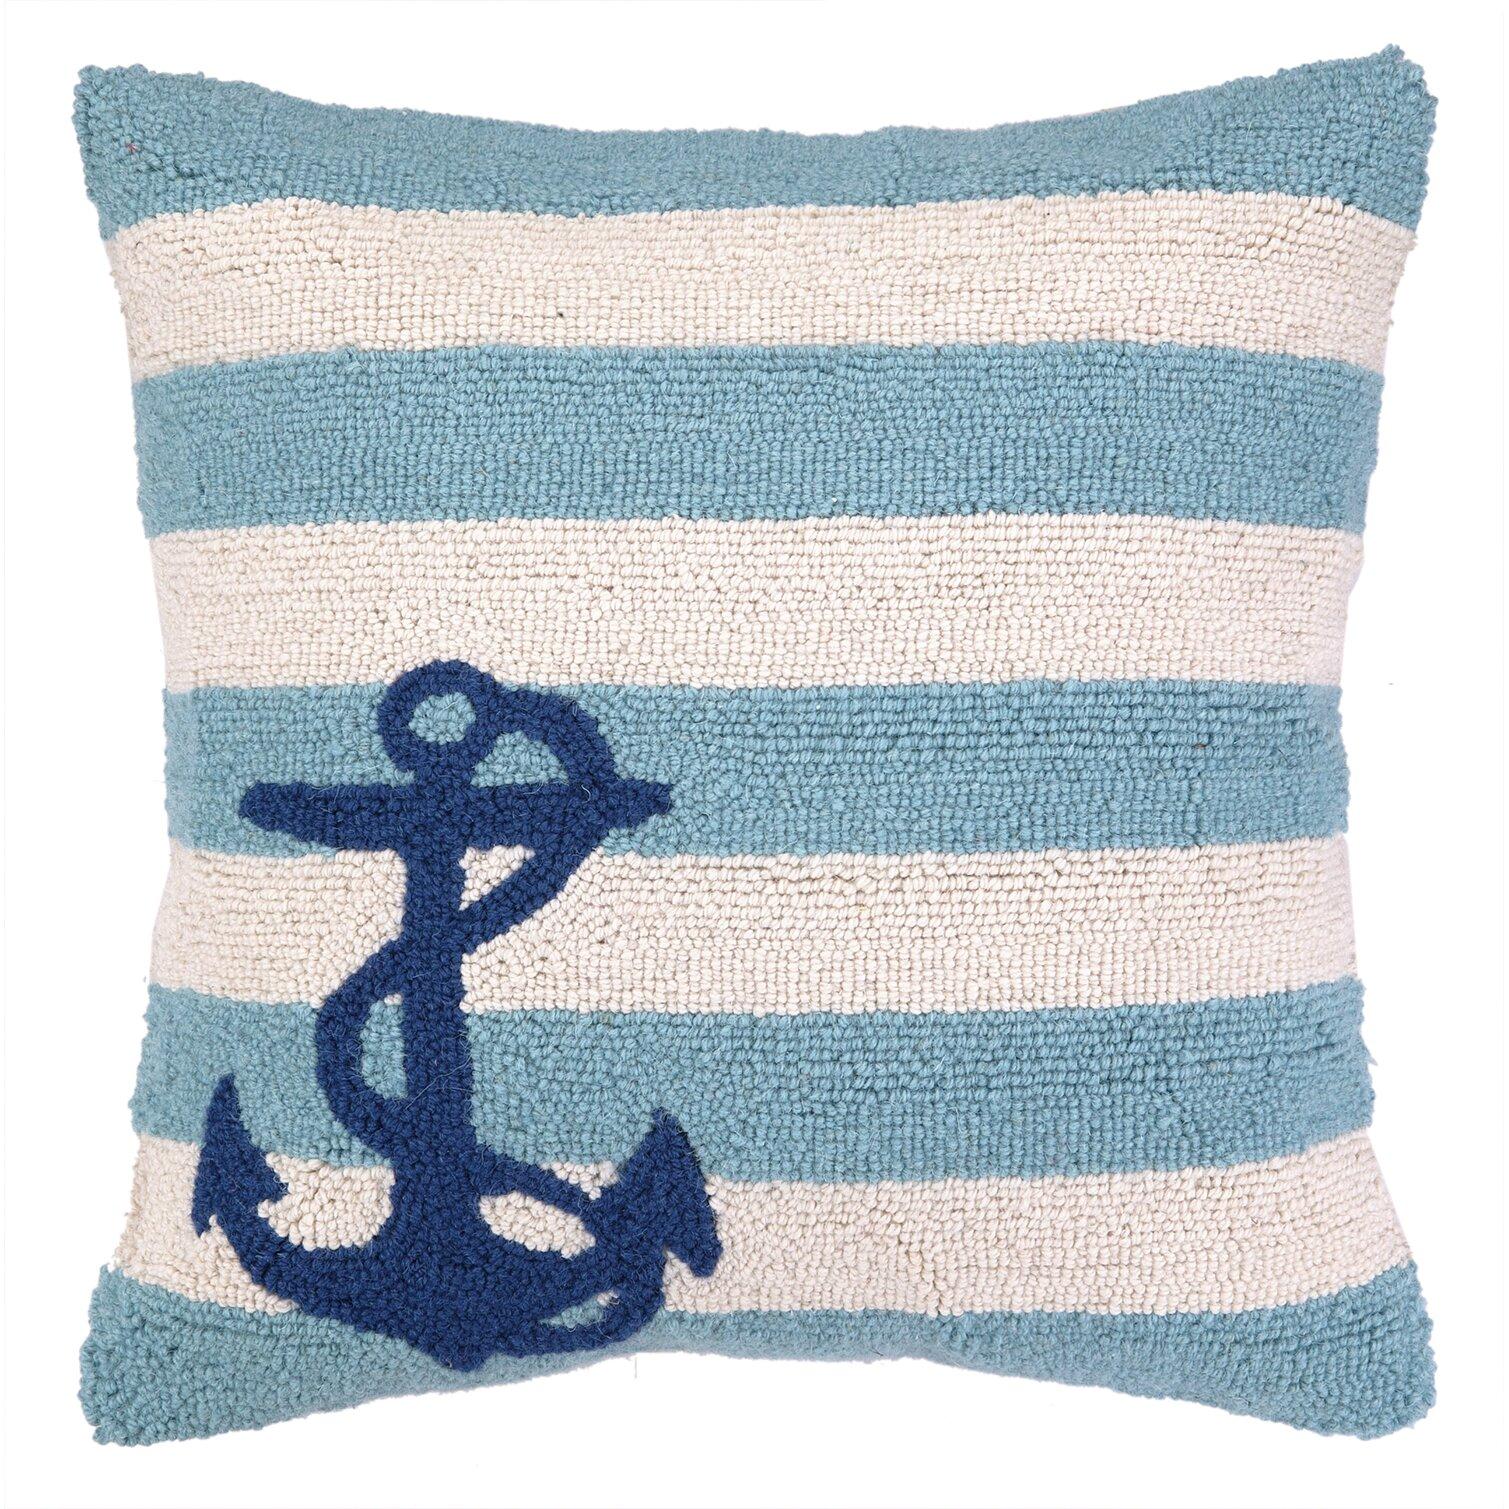 Throw Pillow Nautical : Peking Handicraft Nautical Hook Anchor Stripes Throw Pillow & Reviews Wayfair